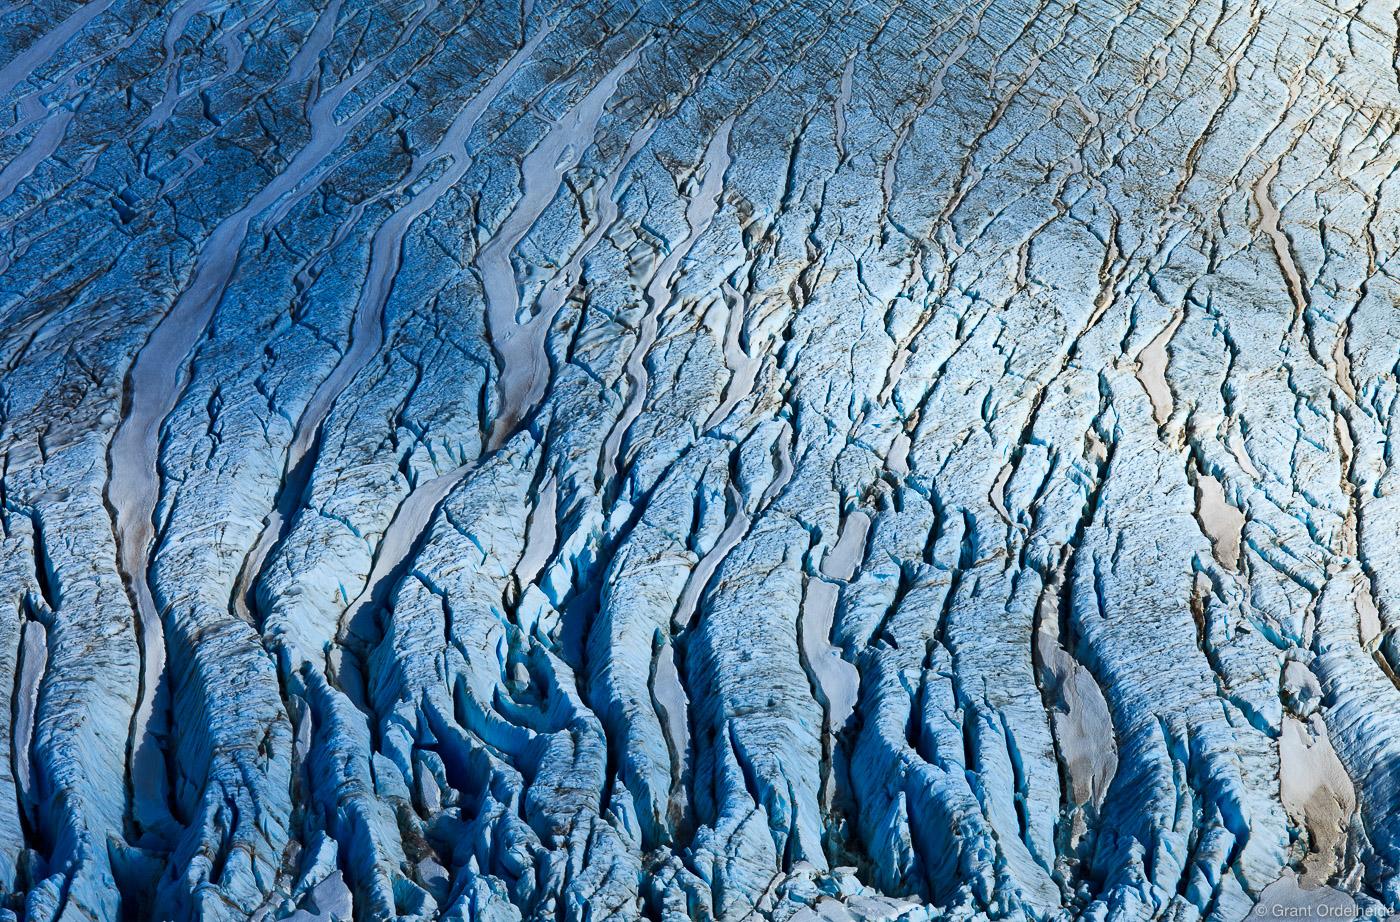 A close up view of the crevasses of the Piedras Blancas Glacier below Mount Fitzroy.